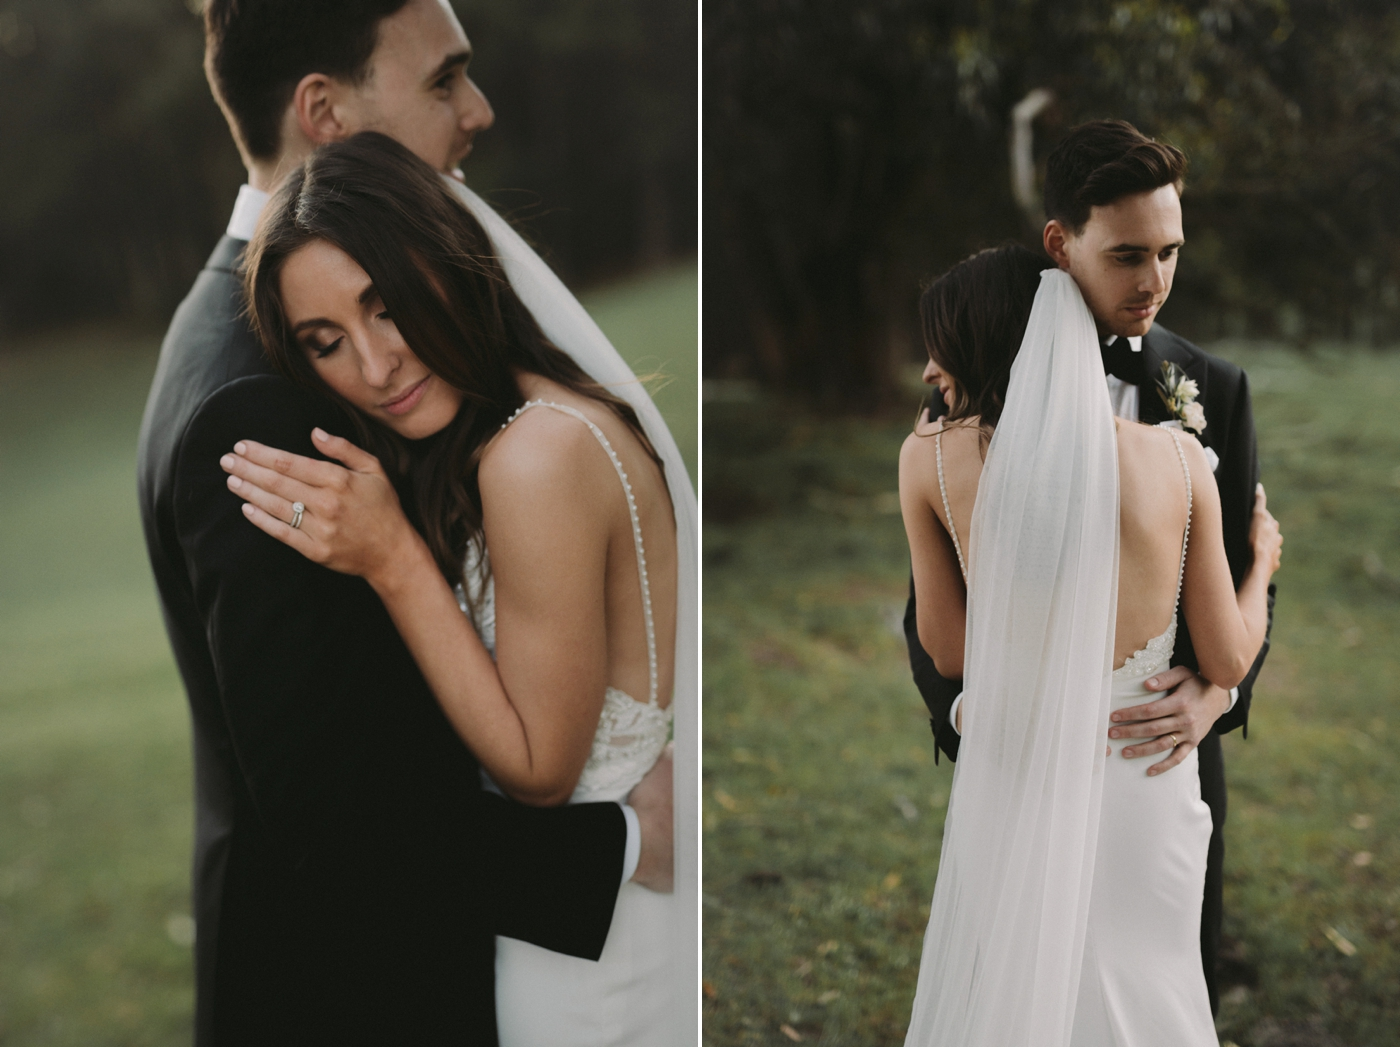 Katie and Ben - Natural Wedding Photography in Adelaide - Beautiful, Candid Wedding Photographer - Adelaide Hills Wedding - Katherine Schultz - www.katherineschultzphotography.com_0068.jpg